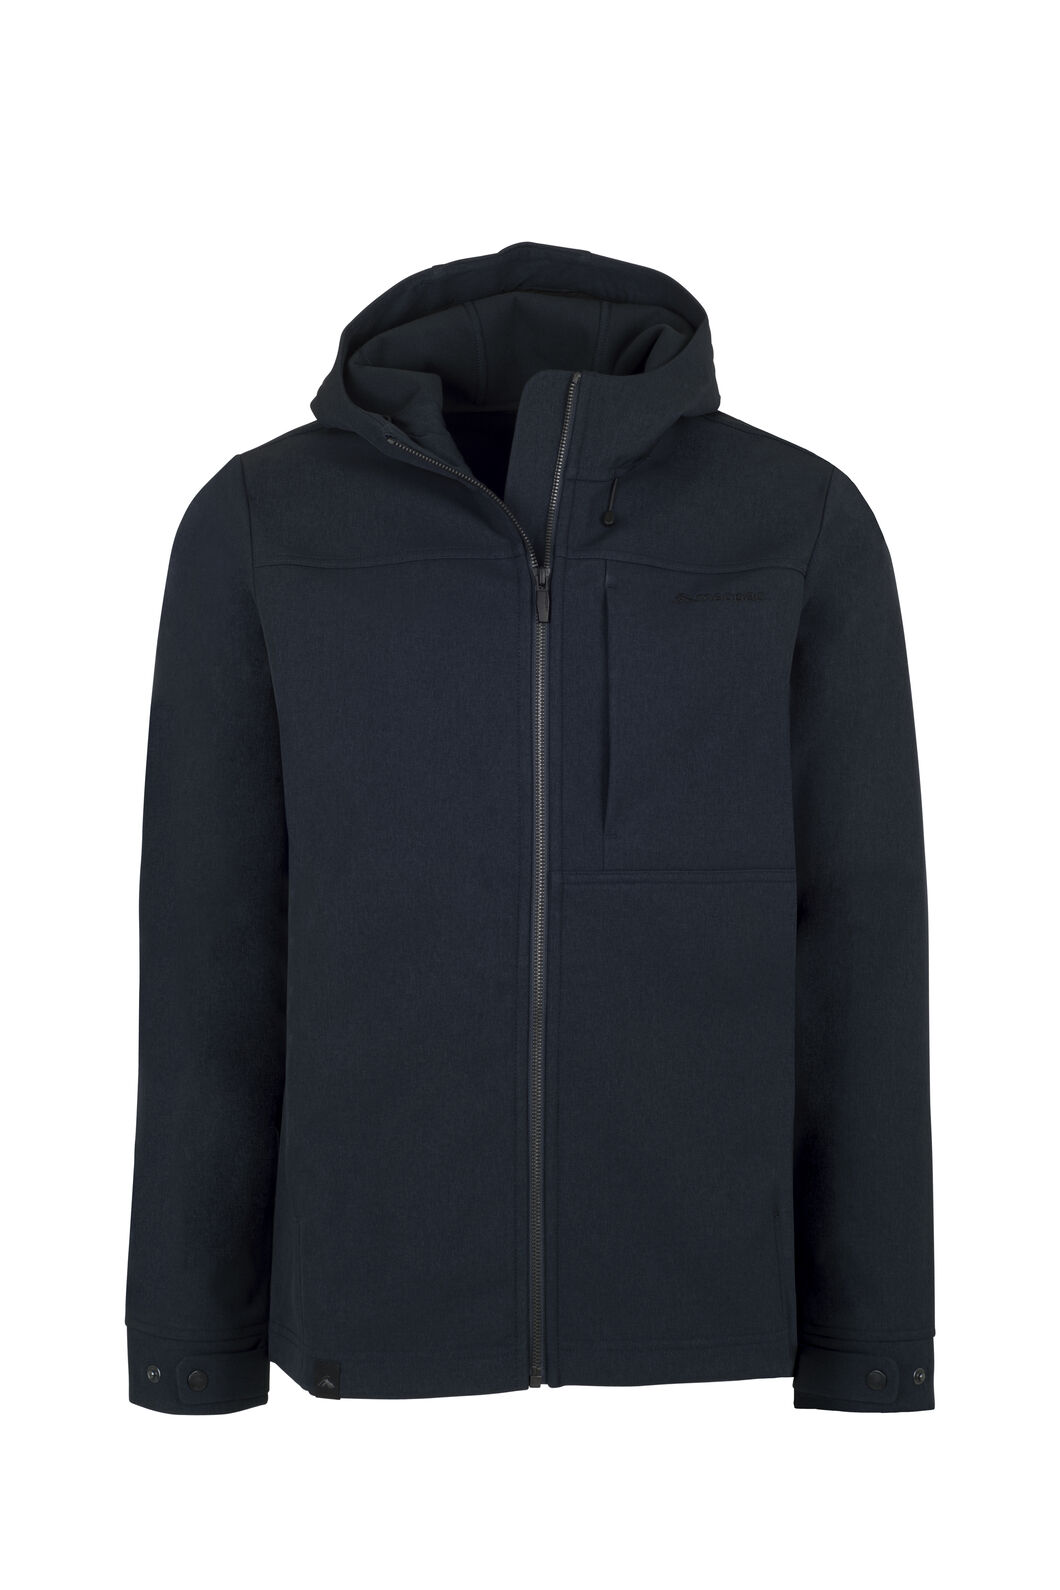 Macpac Chord Softshell Hooded Jacket — Men's, Carbon, hi-res